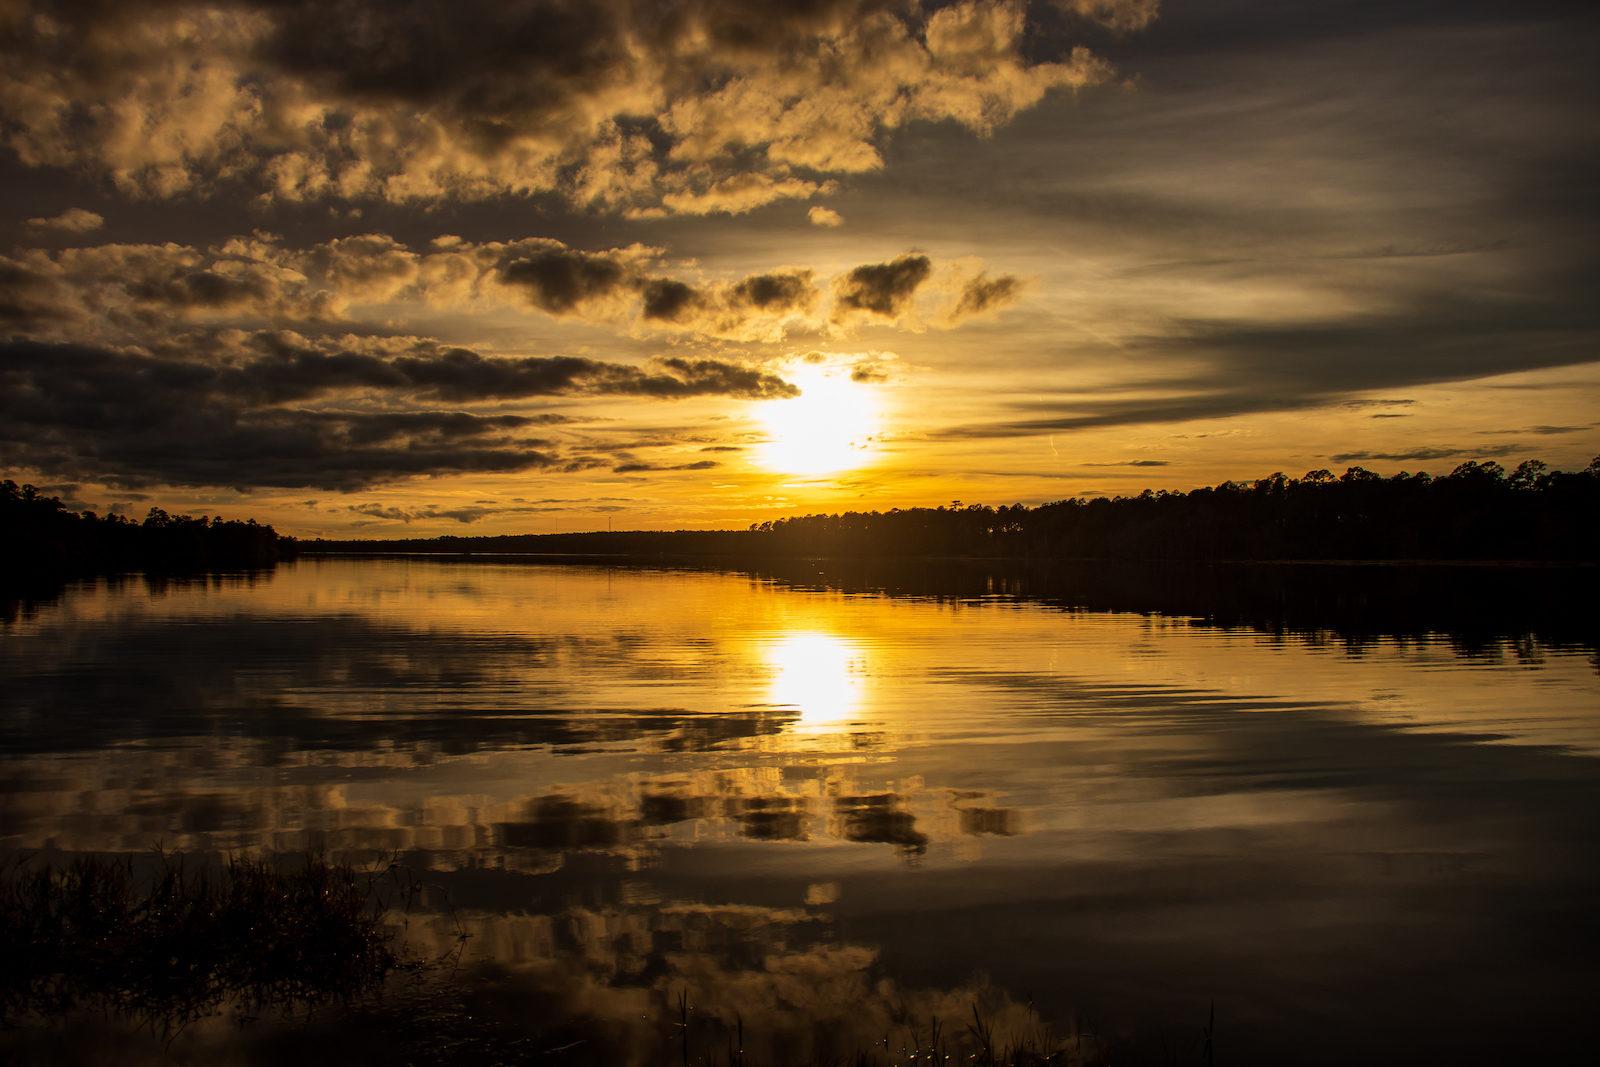 Almost sunset on Big Creek Lake